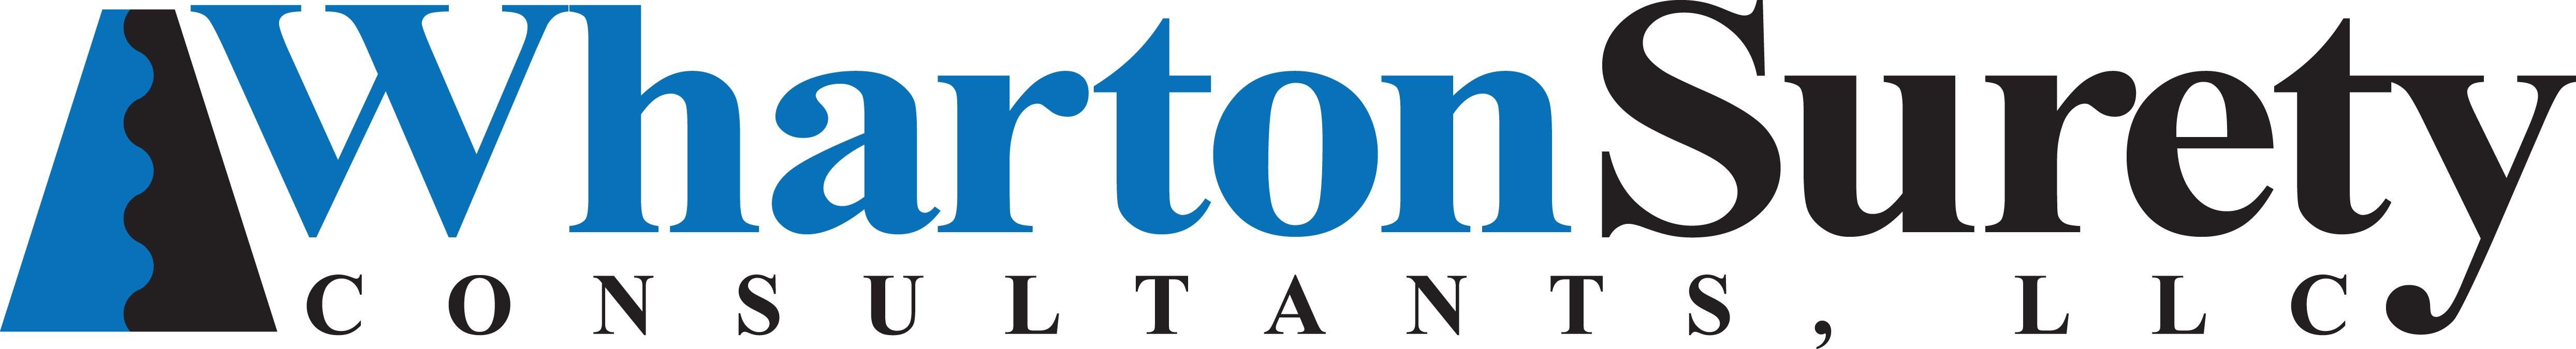 Wharton Surety Consultants, LLC